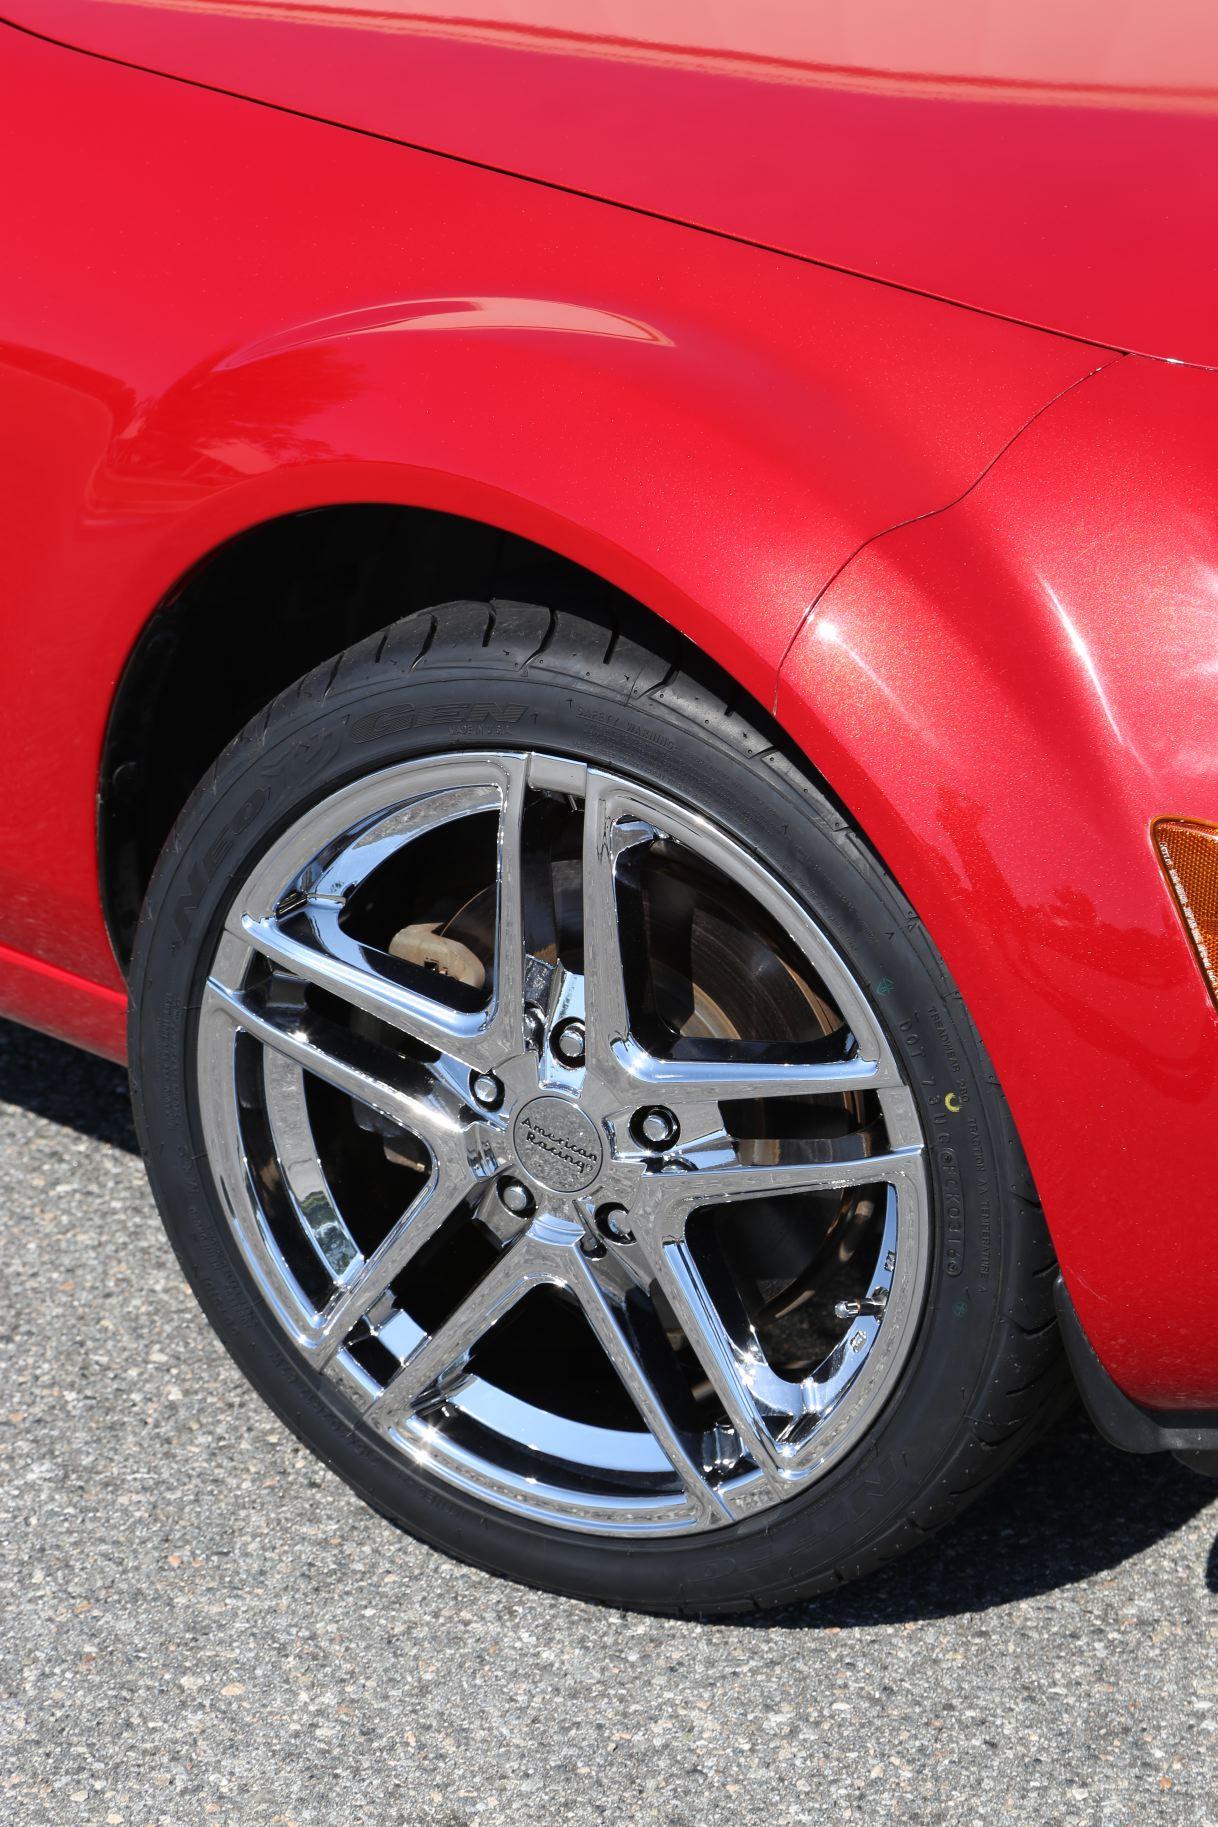 06 Miata With American Racing Wheels Trinity Motorsports